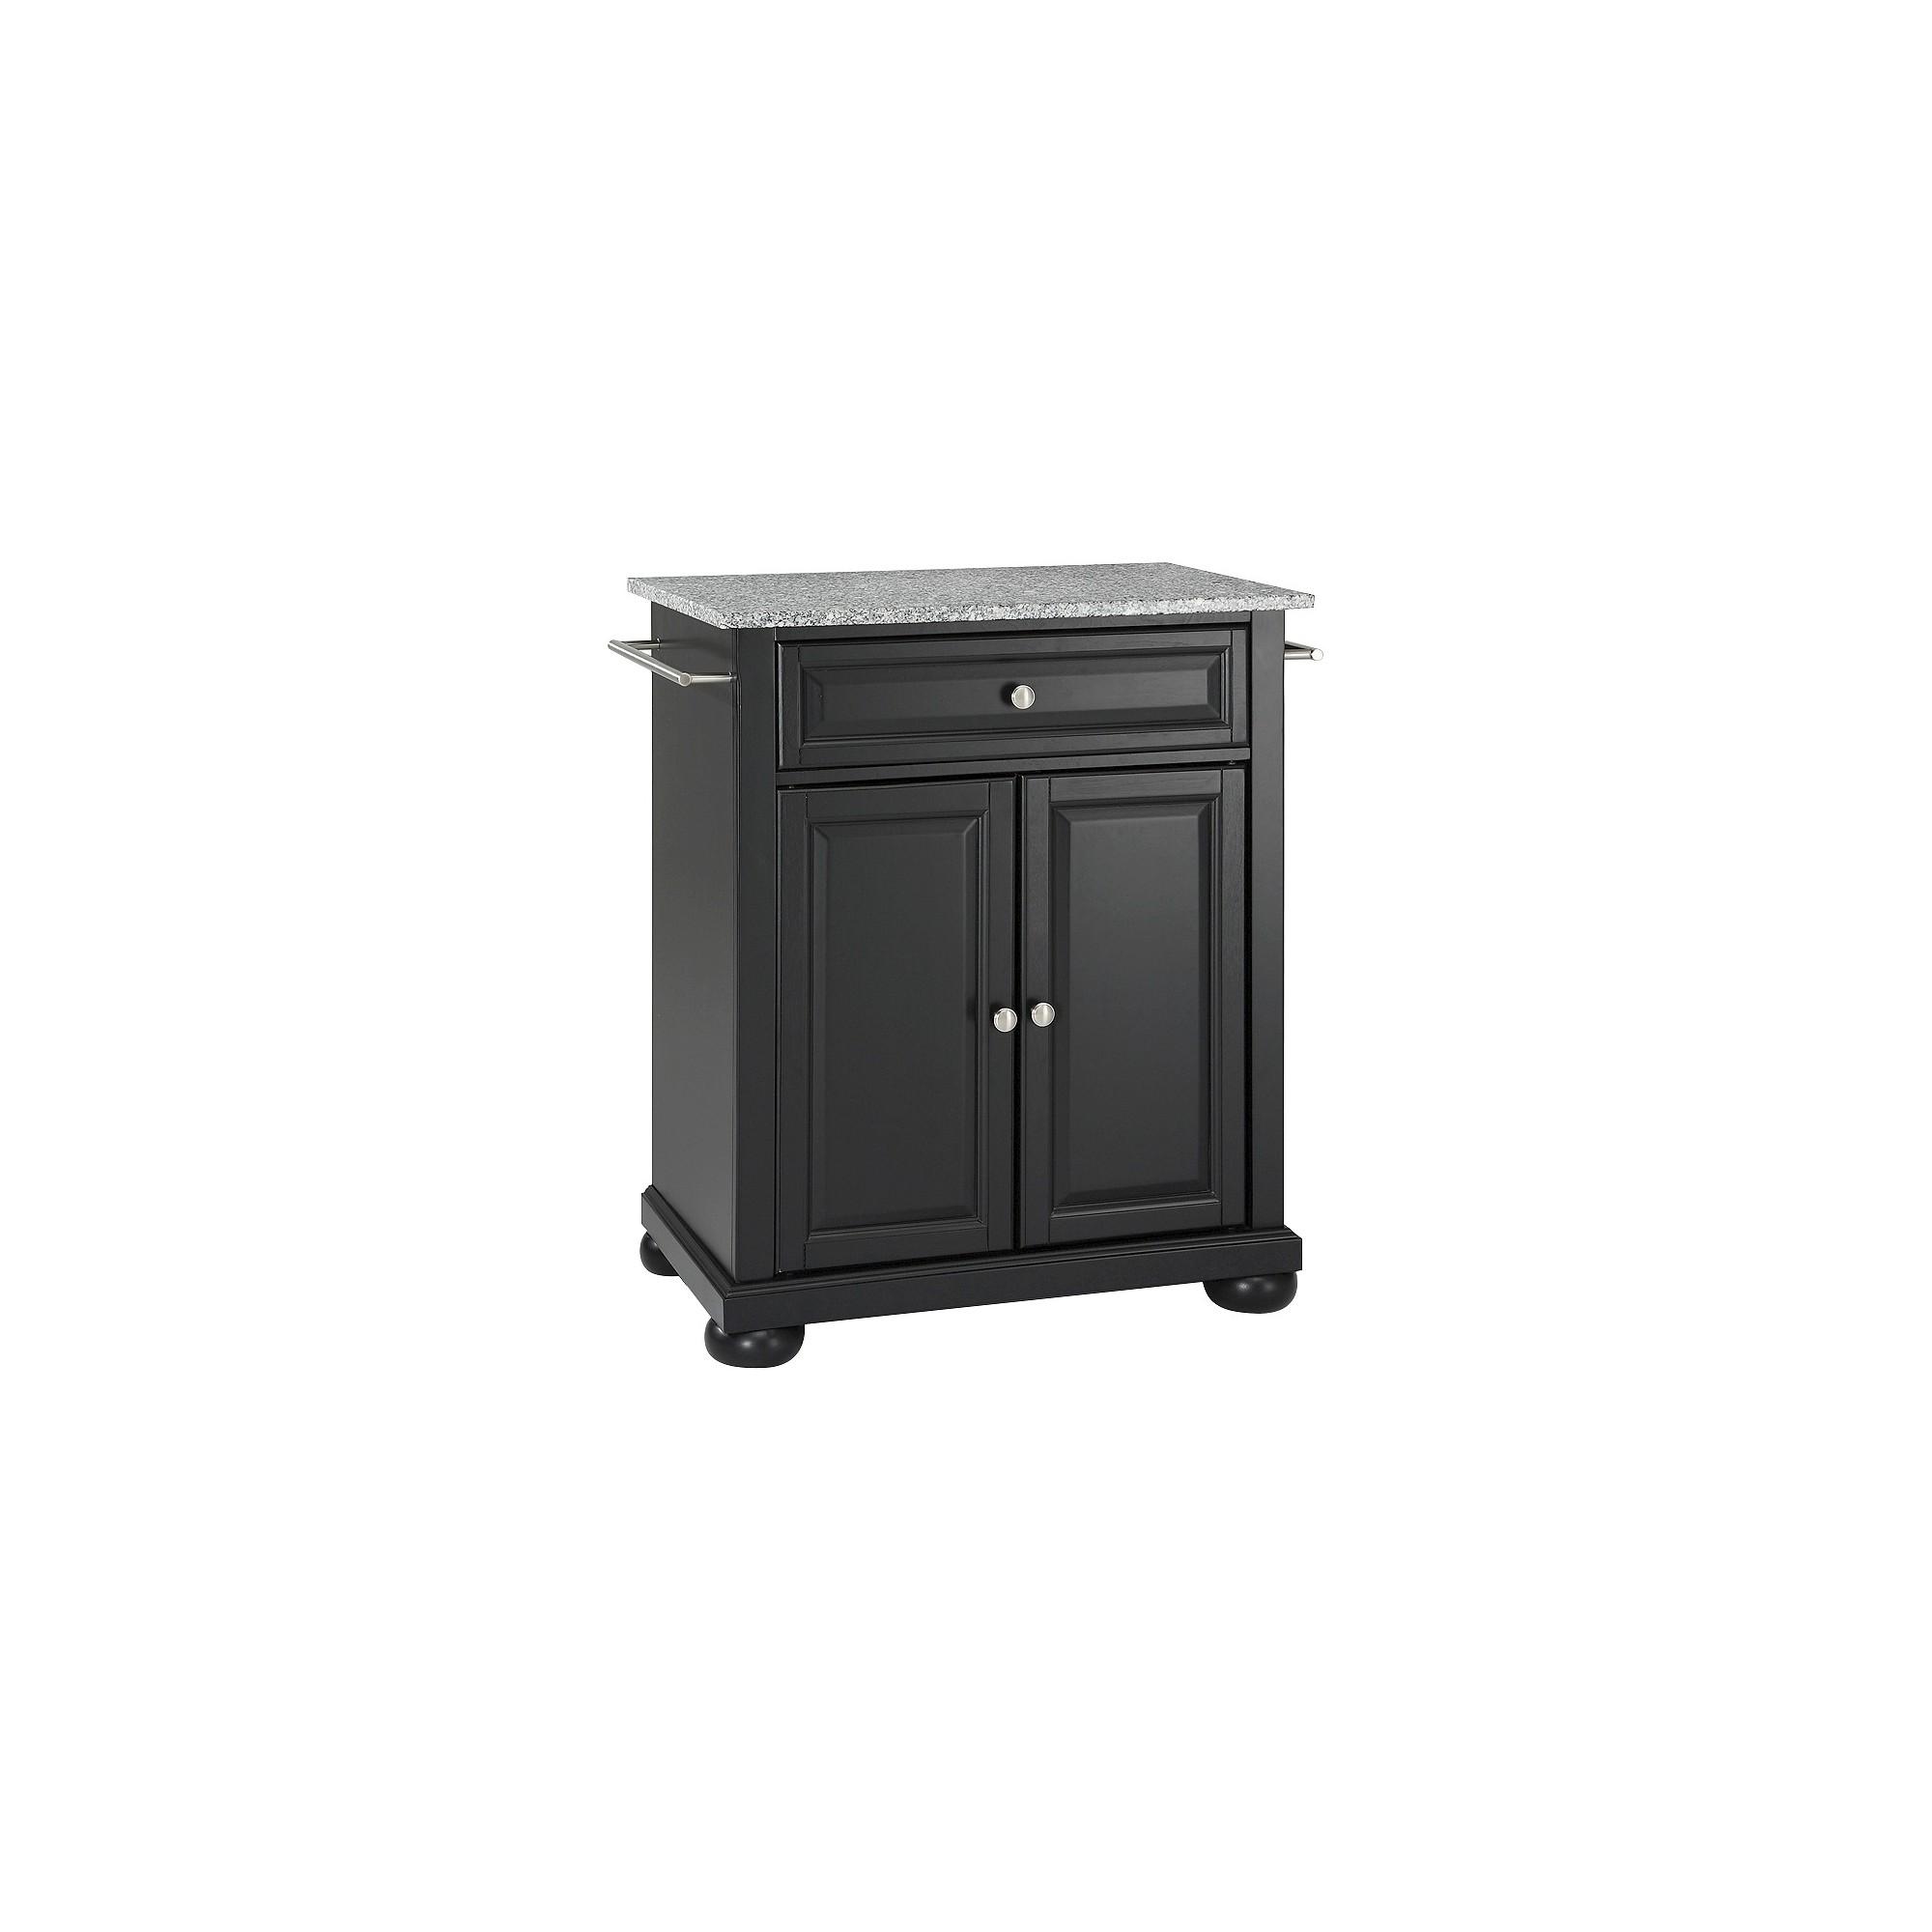 Alexandria solid granite top portable kitchen island black